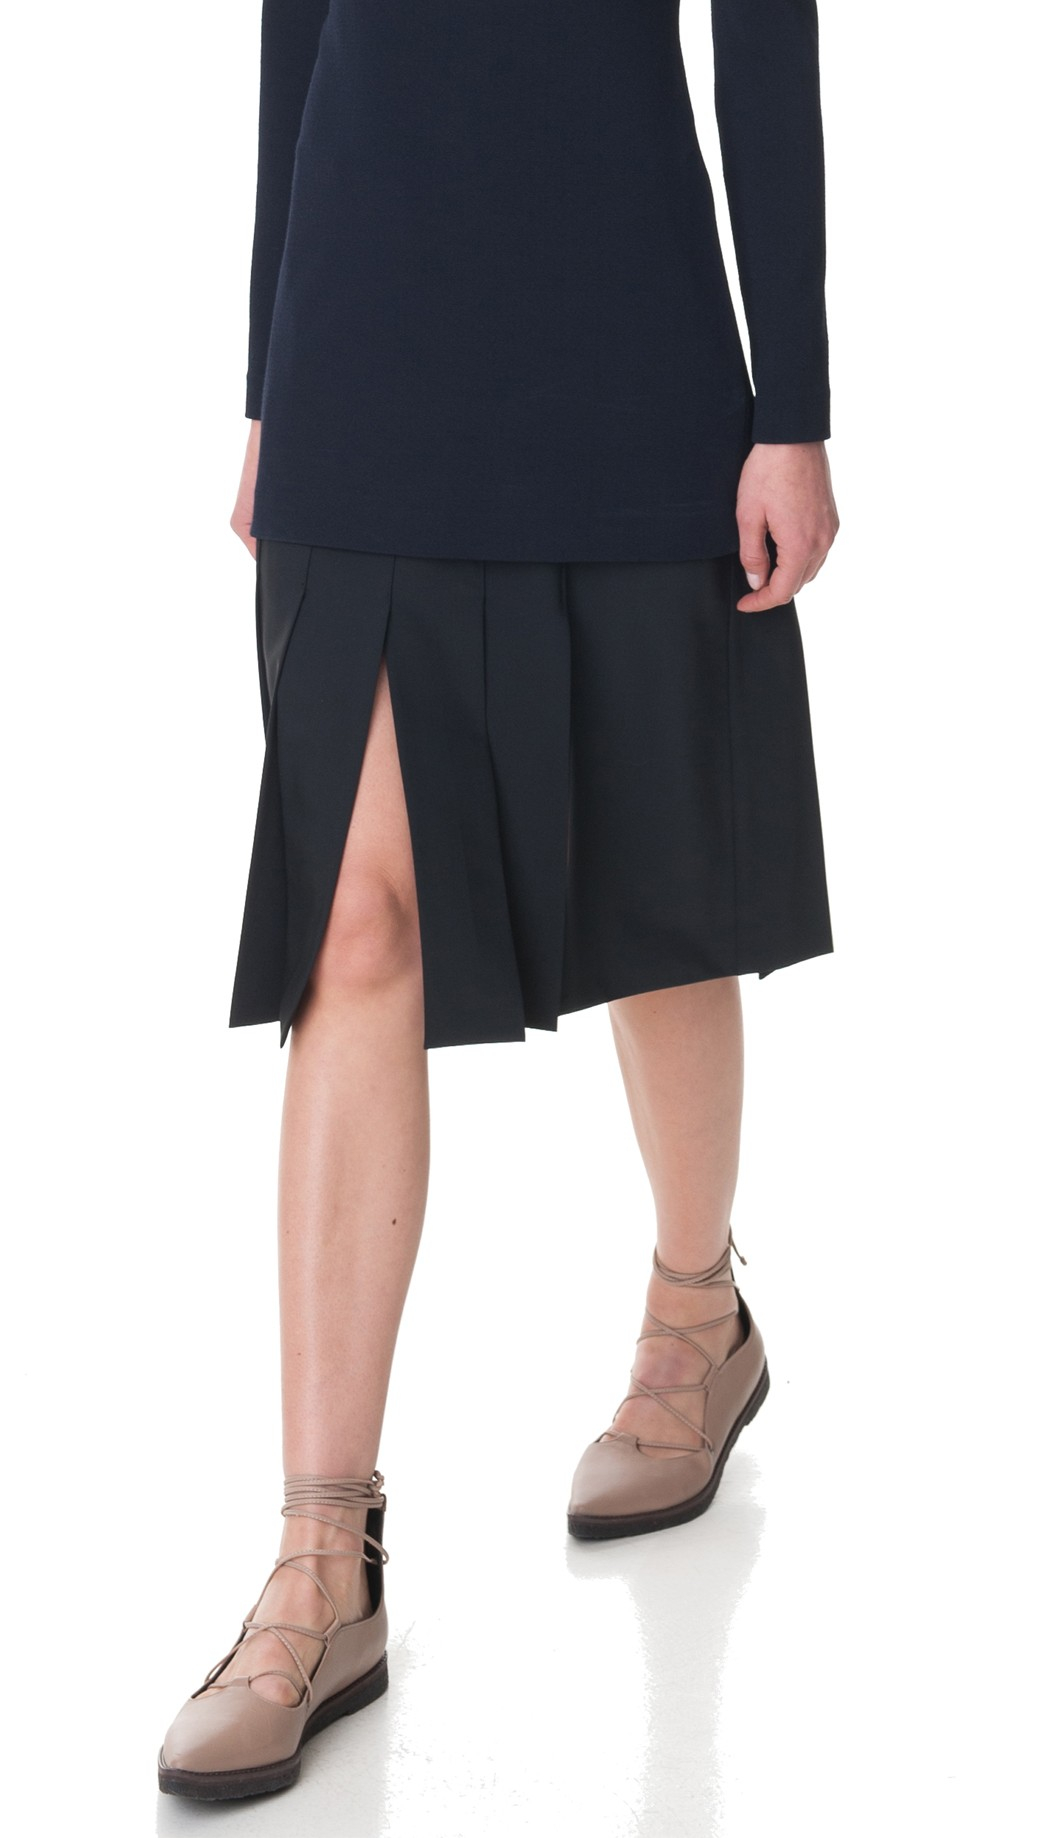 tibi cuarteto carwash midi skirt in black lyst